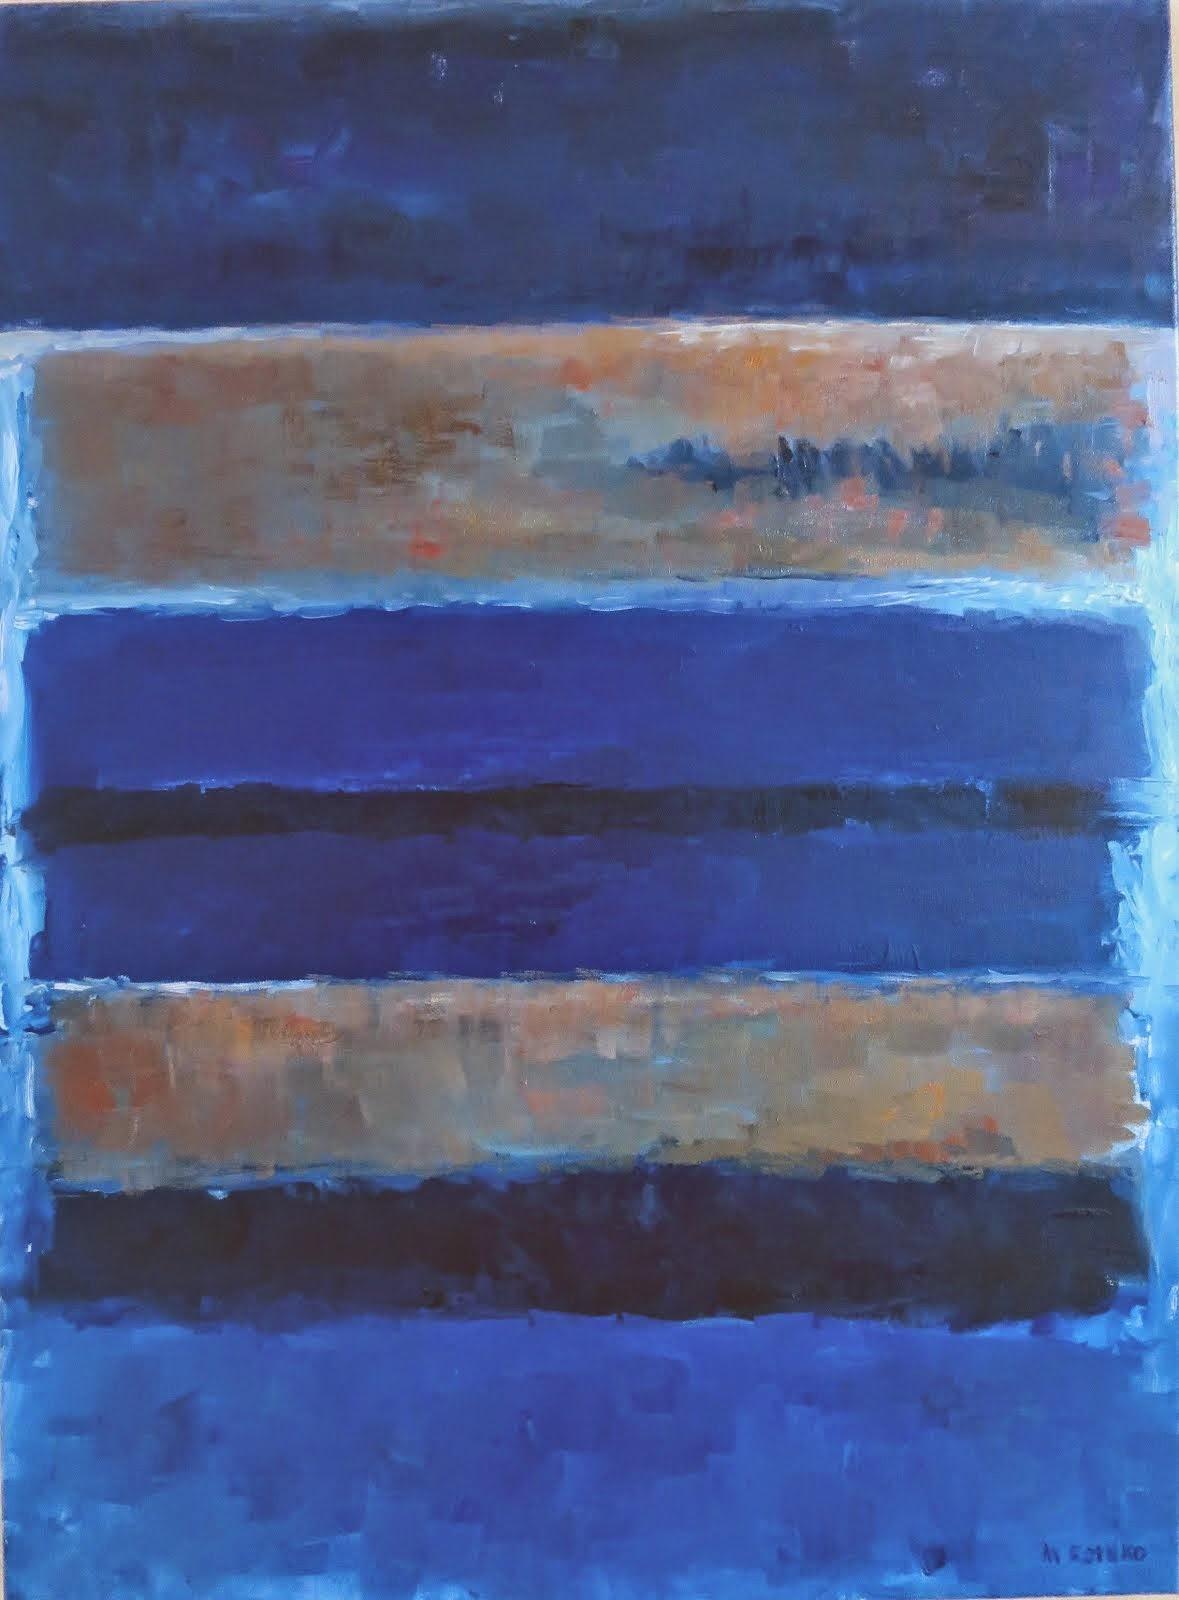 A la manera de Rothko (25P)